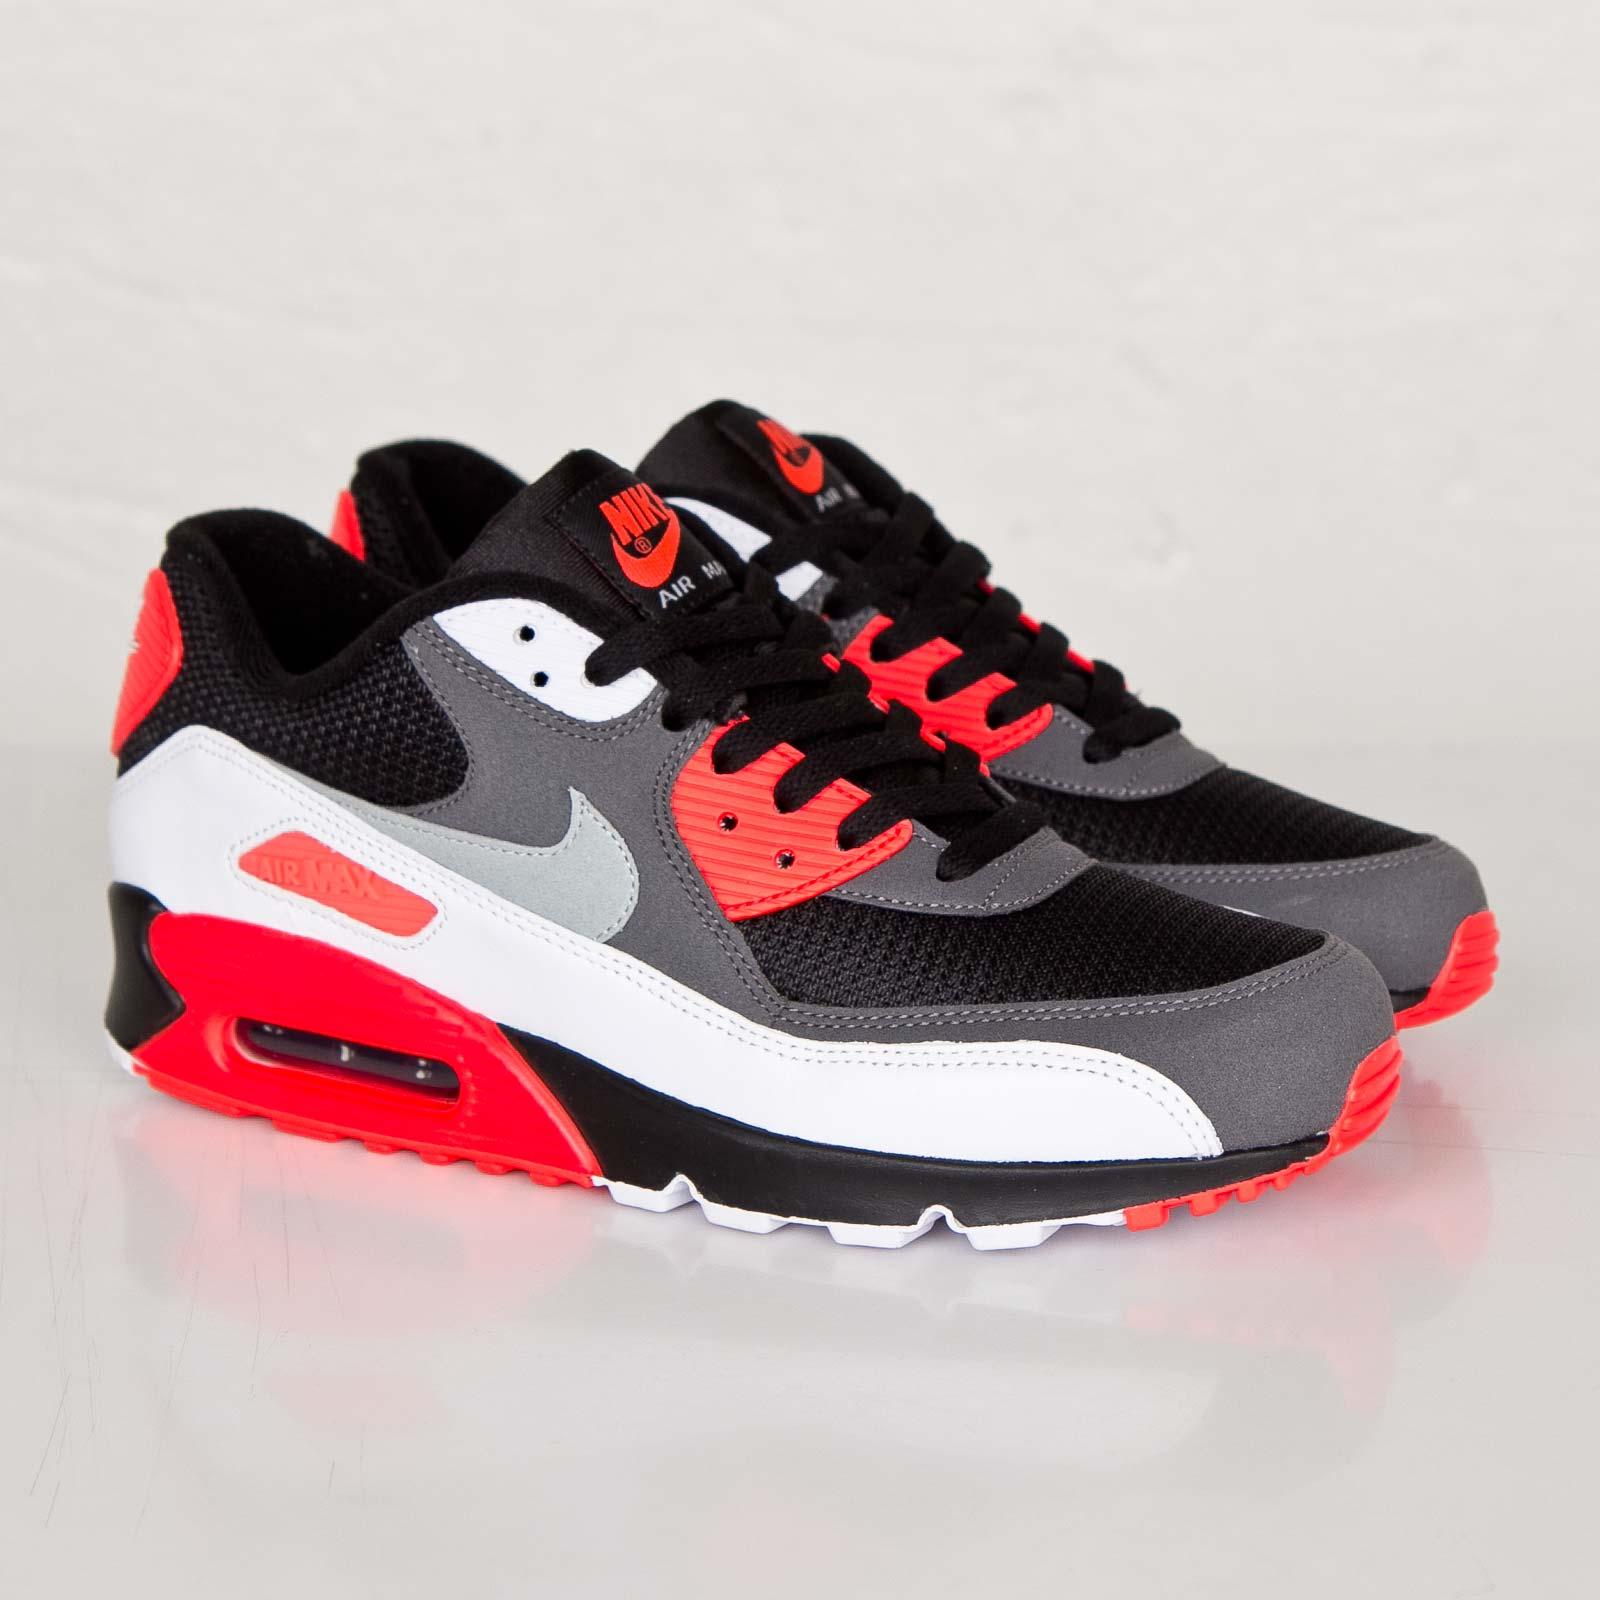 insondable Comida sana Carne de cordero  Nike Air Max 90 OG - 725233-006 - Sneakersnstuff | sneakers & streetwear  online since 1999